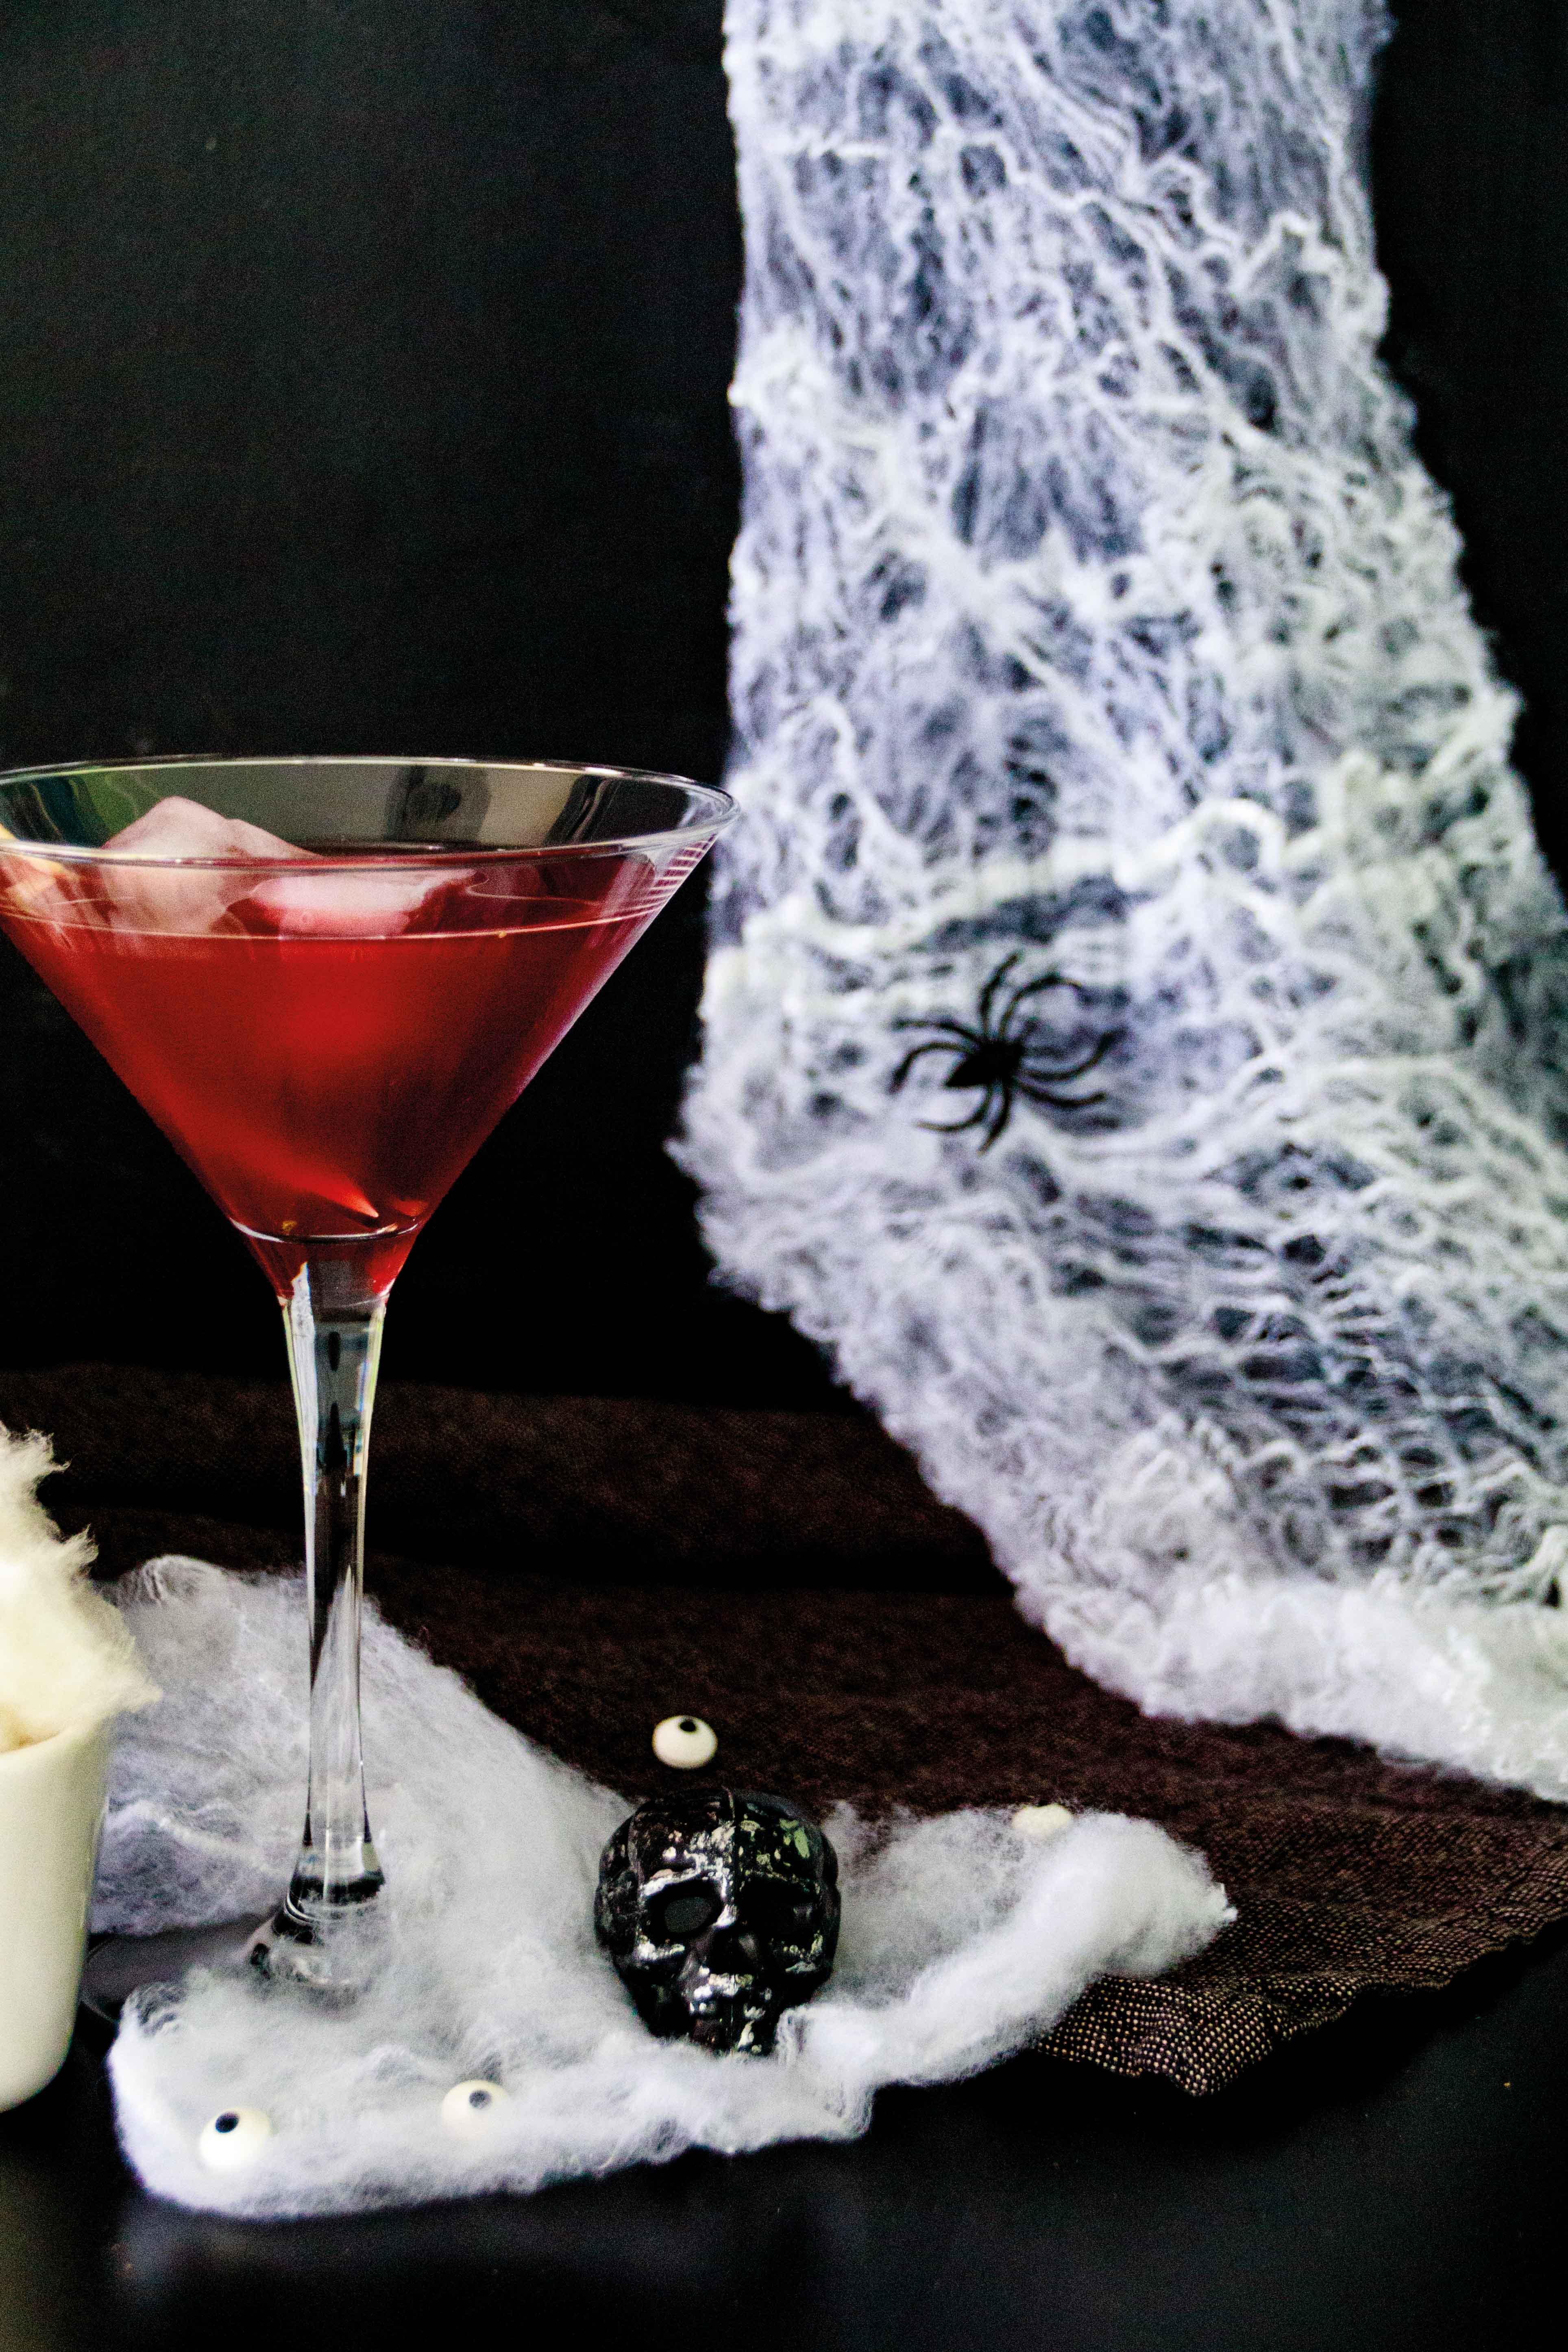 Haloween_Drink_09